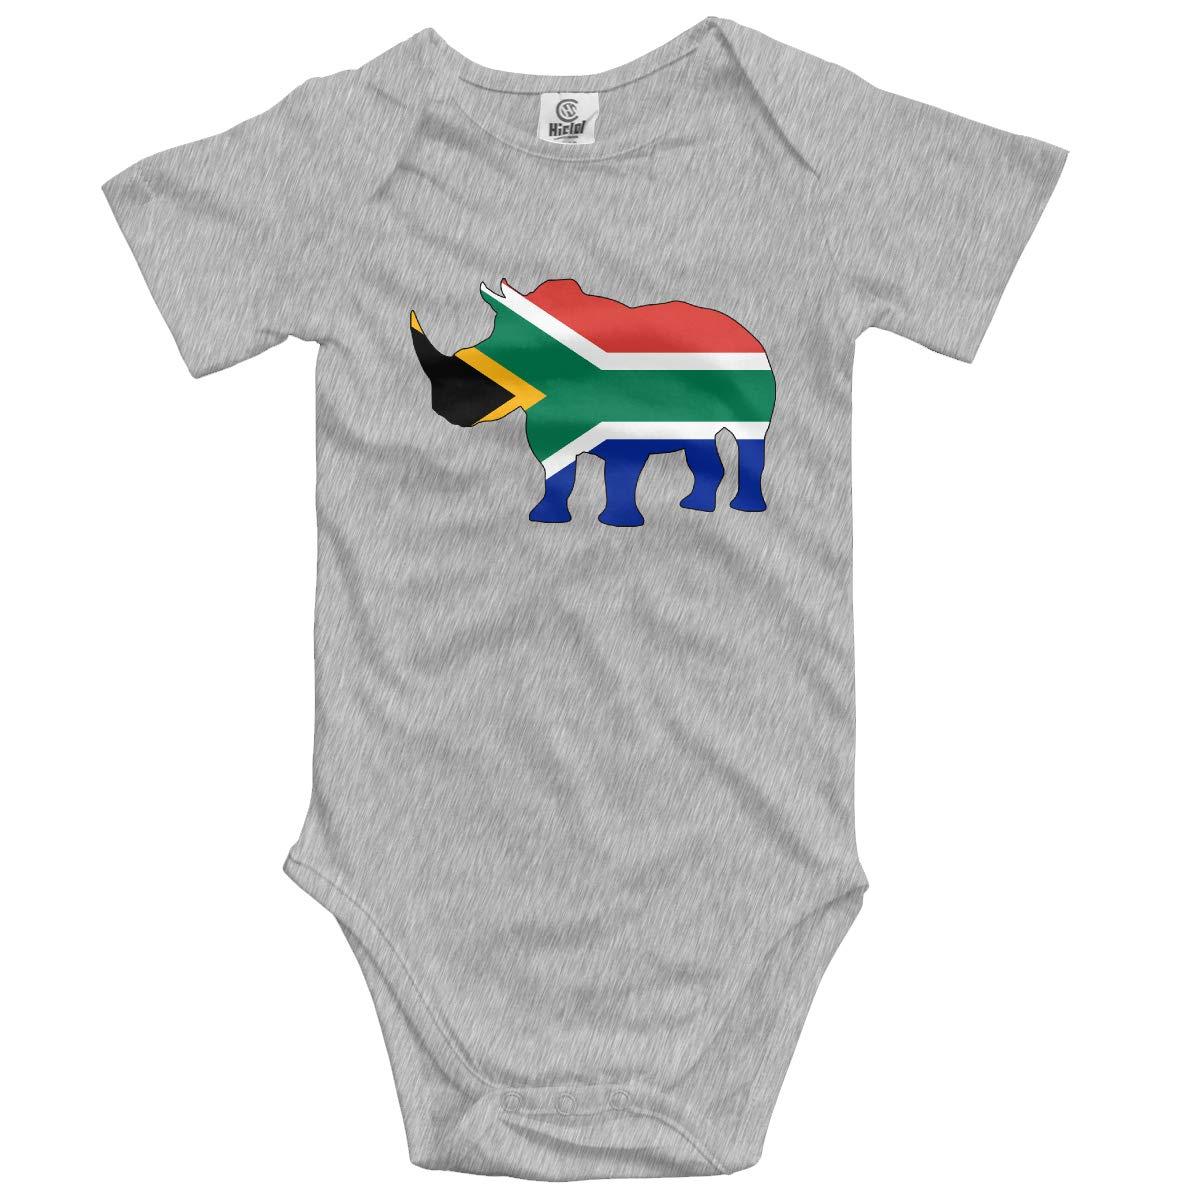 South Africa Flag Rhino Baby Unisex 100/% Organic Cotton Layette Bodysuit 0-24 Months